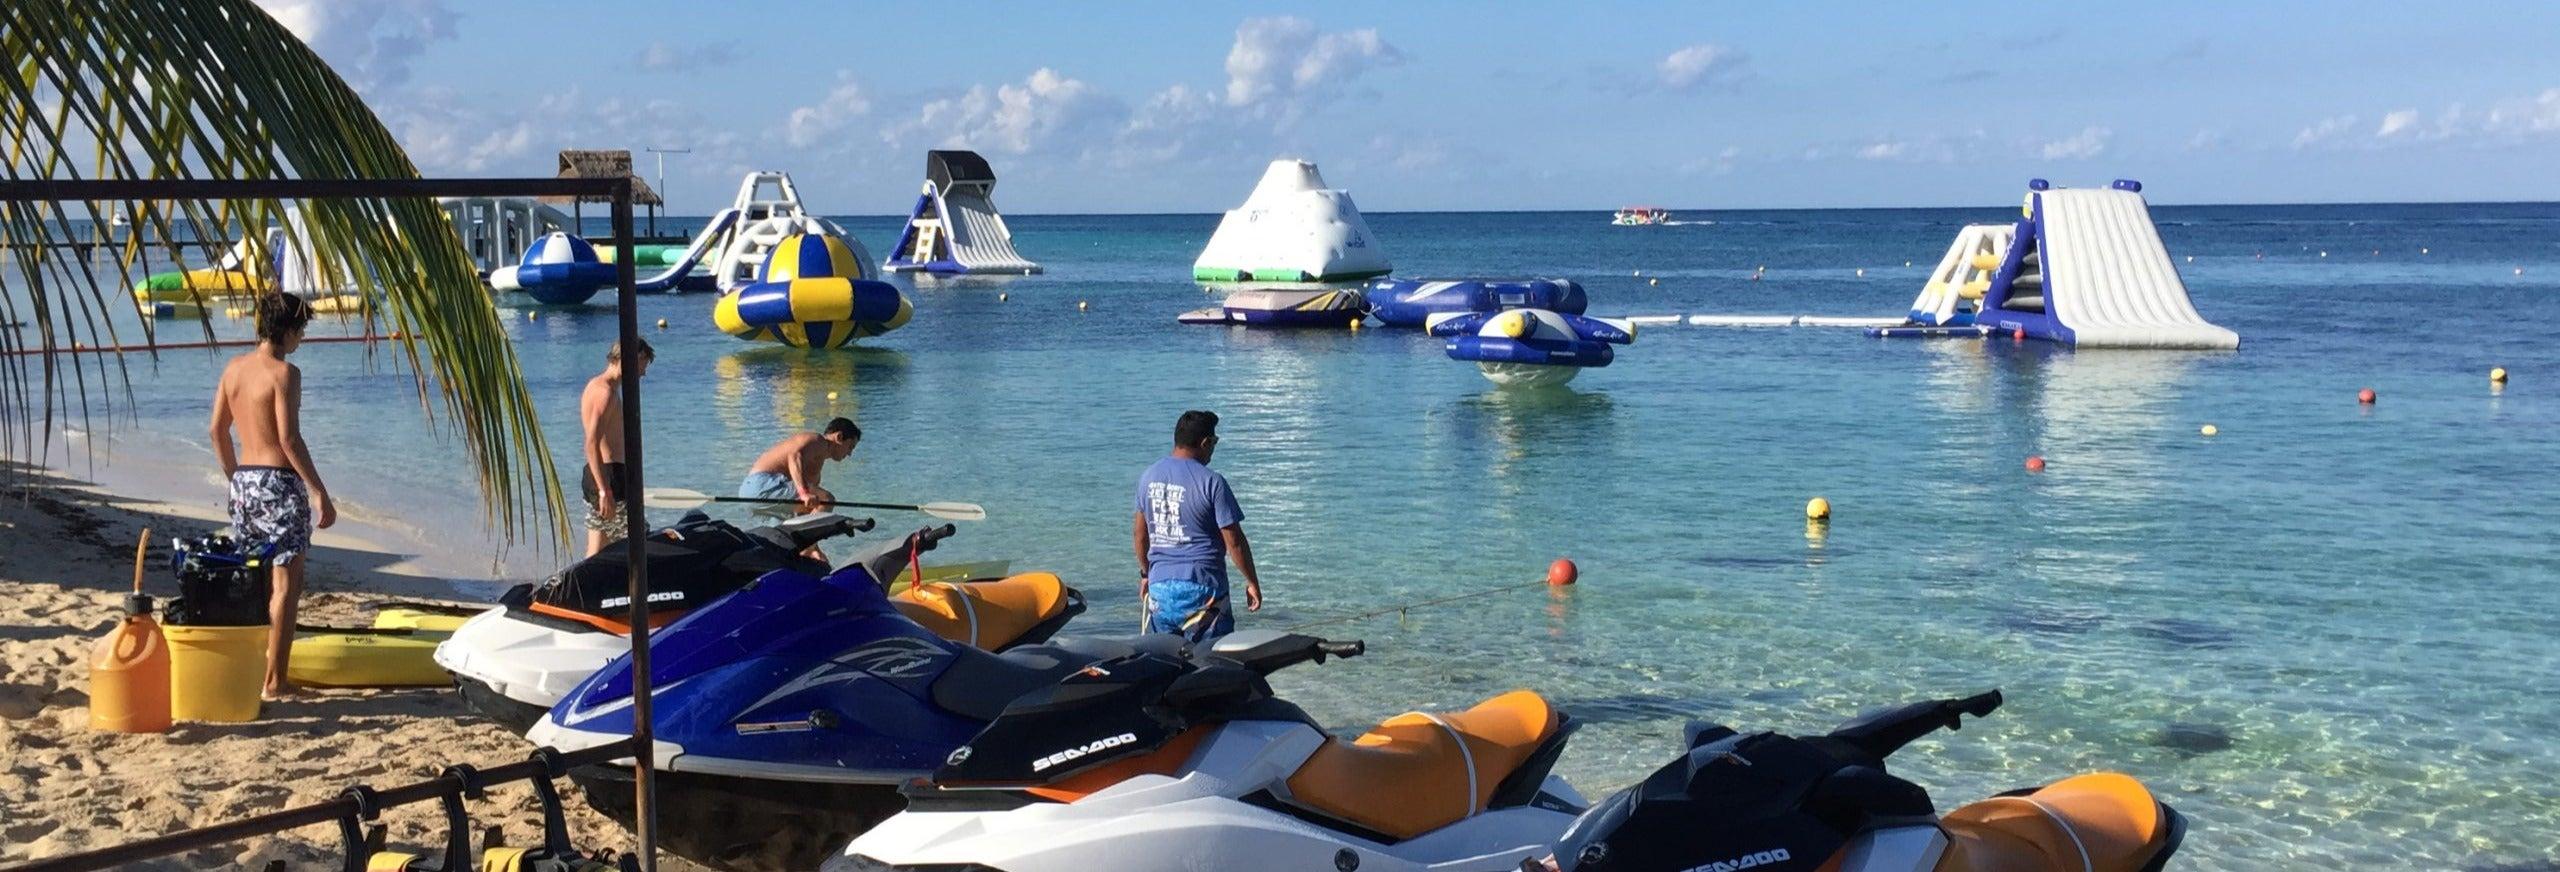 Excursión en moto de agua en Cozumel